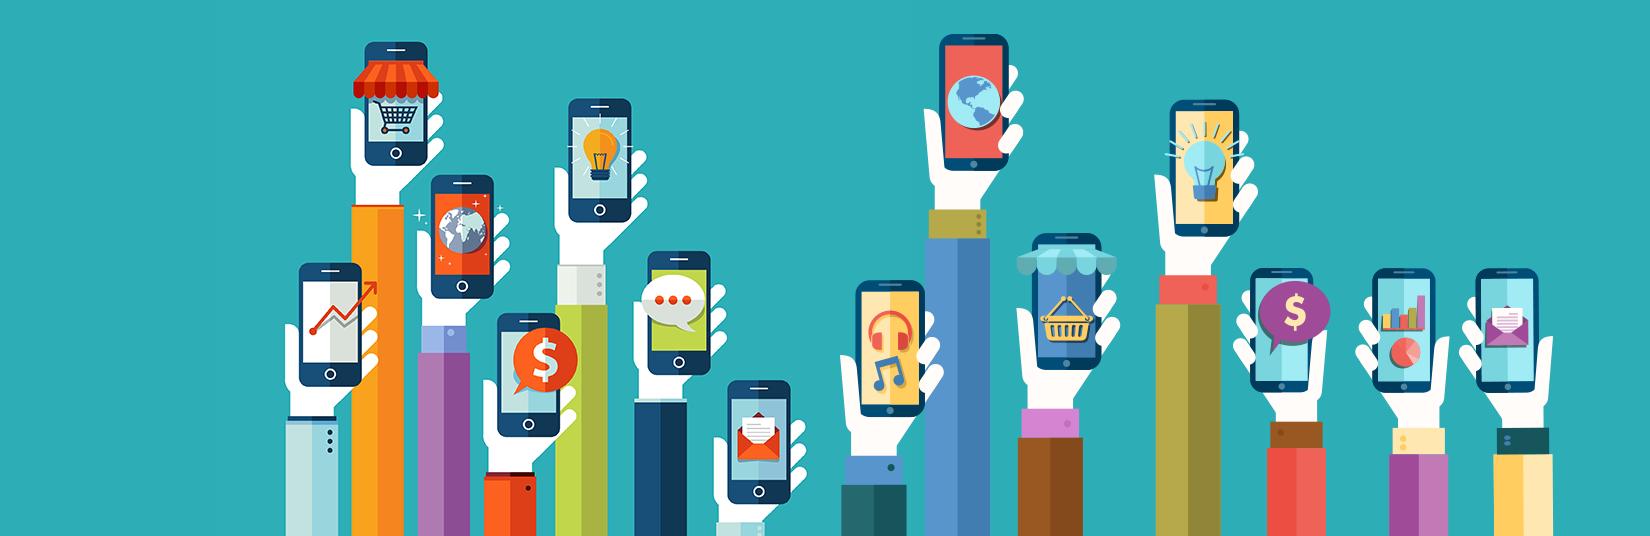 business app development-letsnurture